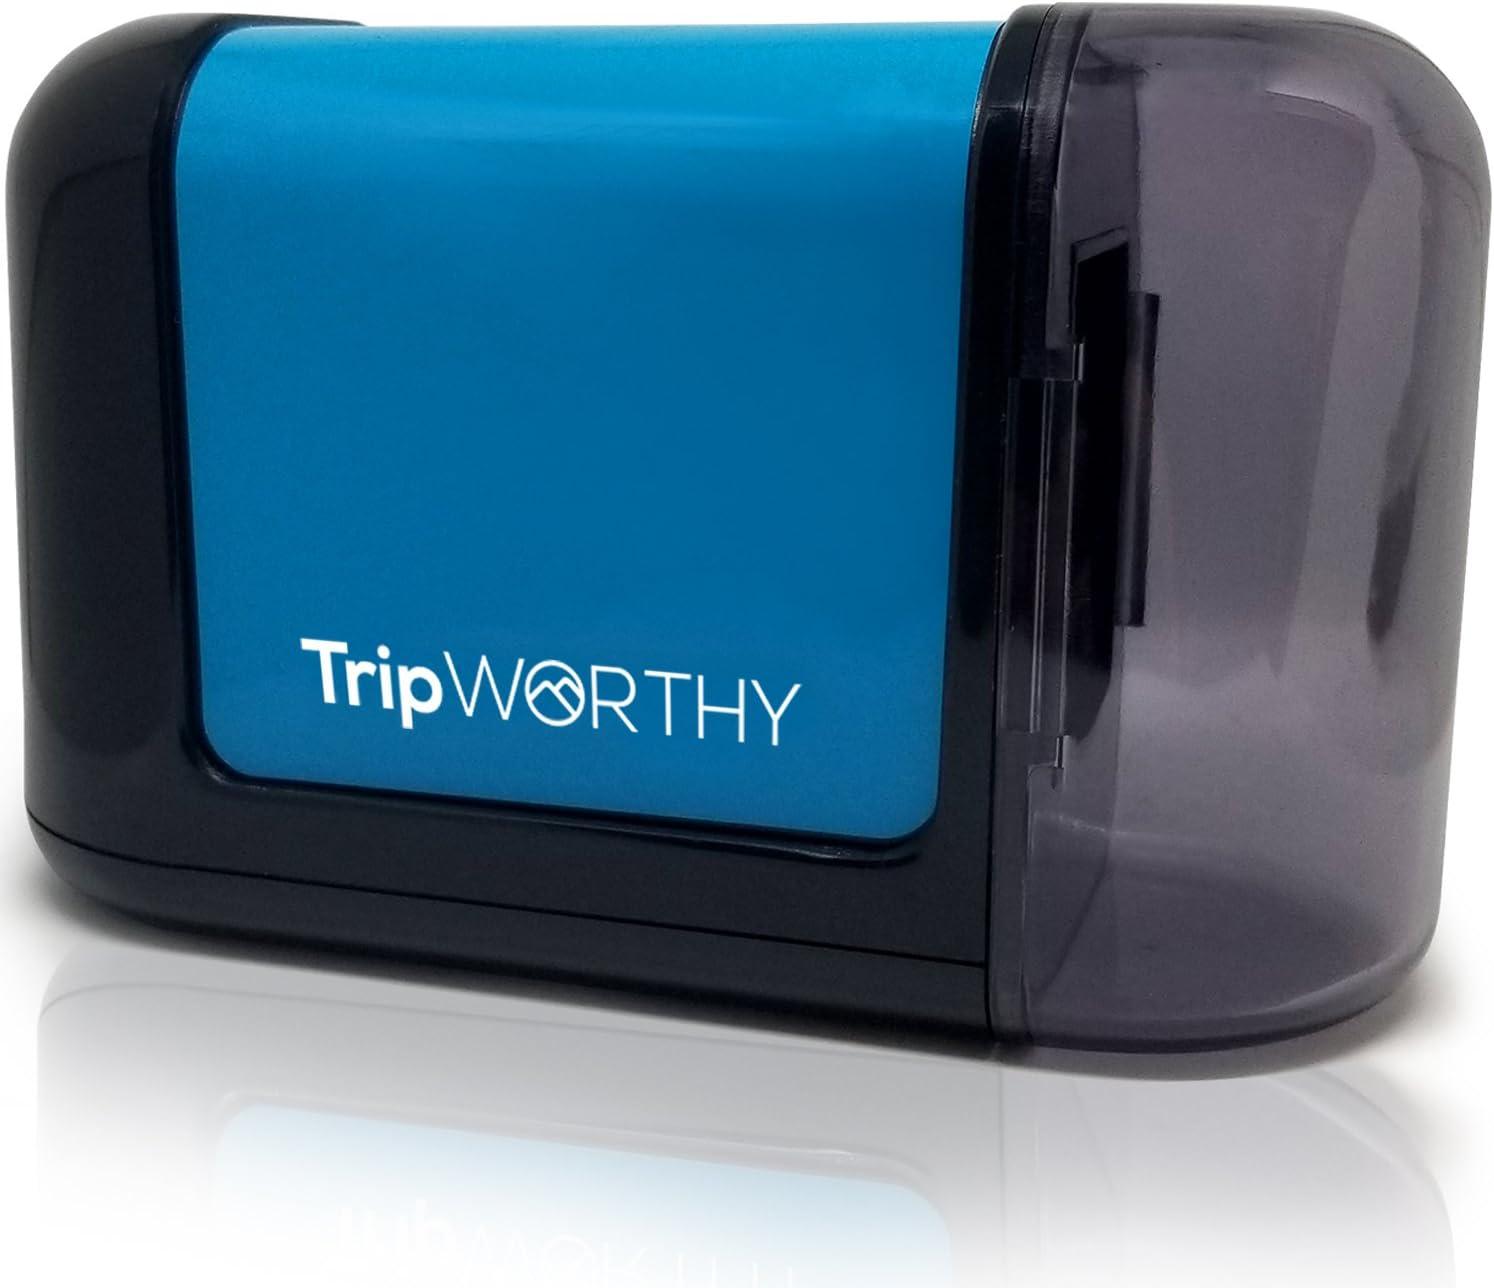 TripworthyElectric Pencil Sharpener